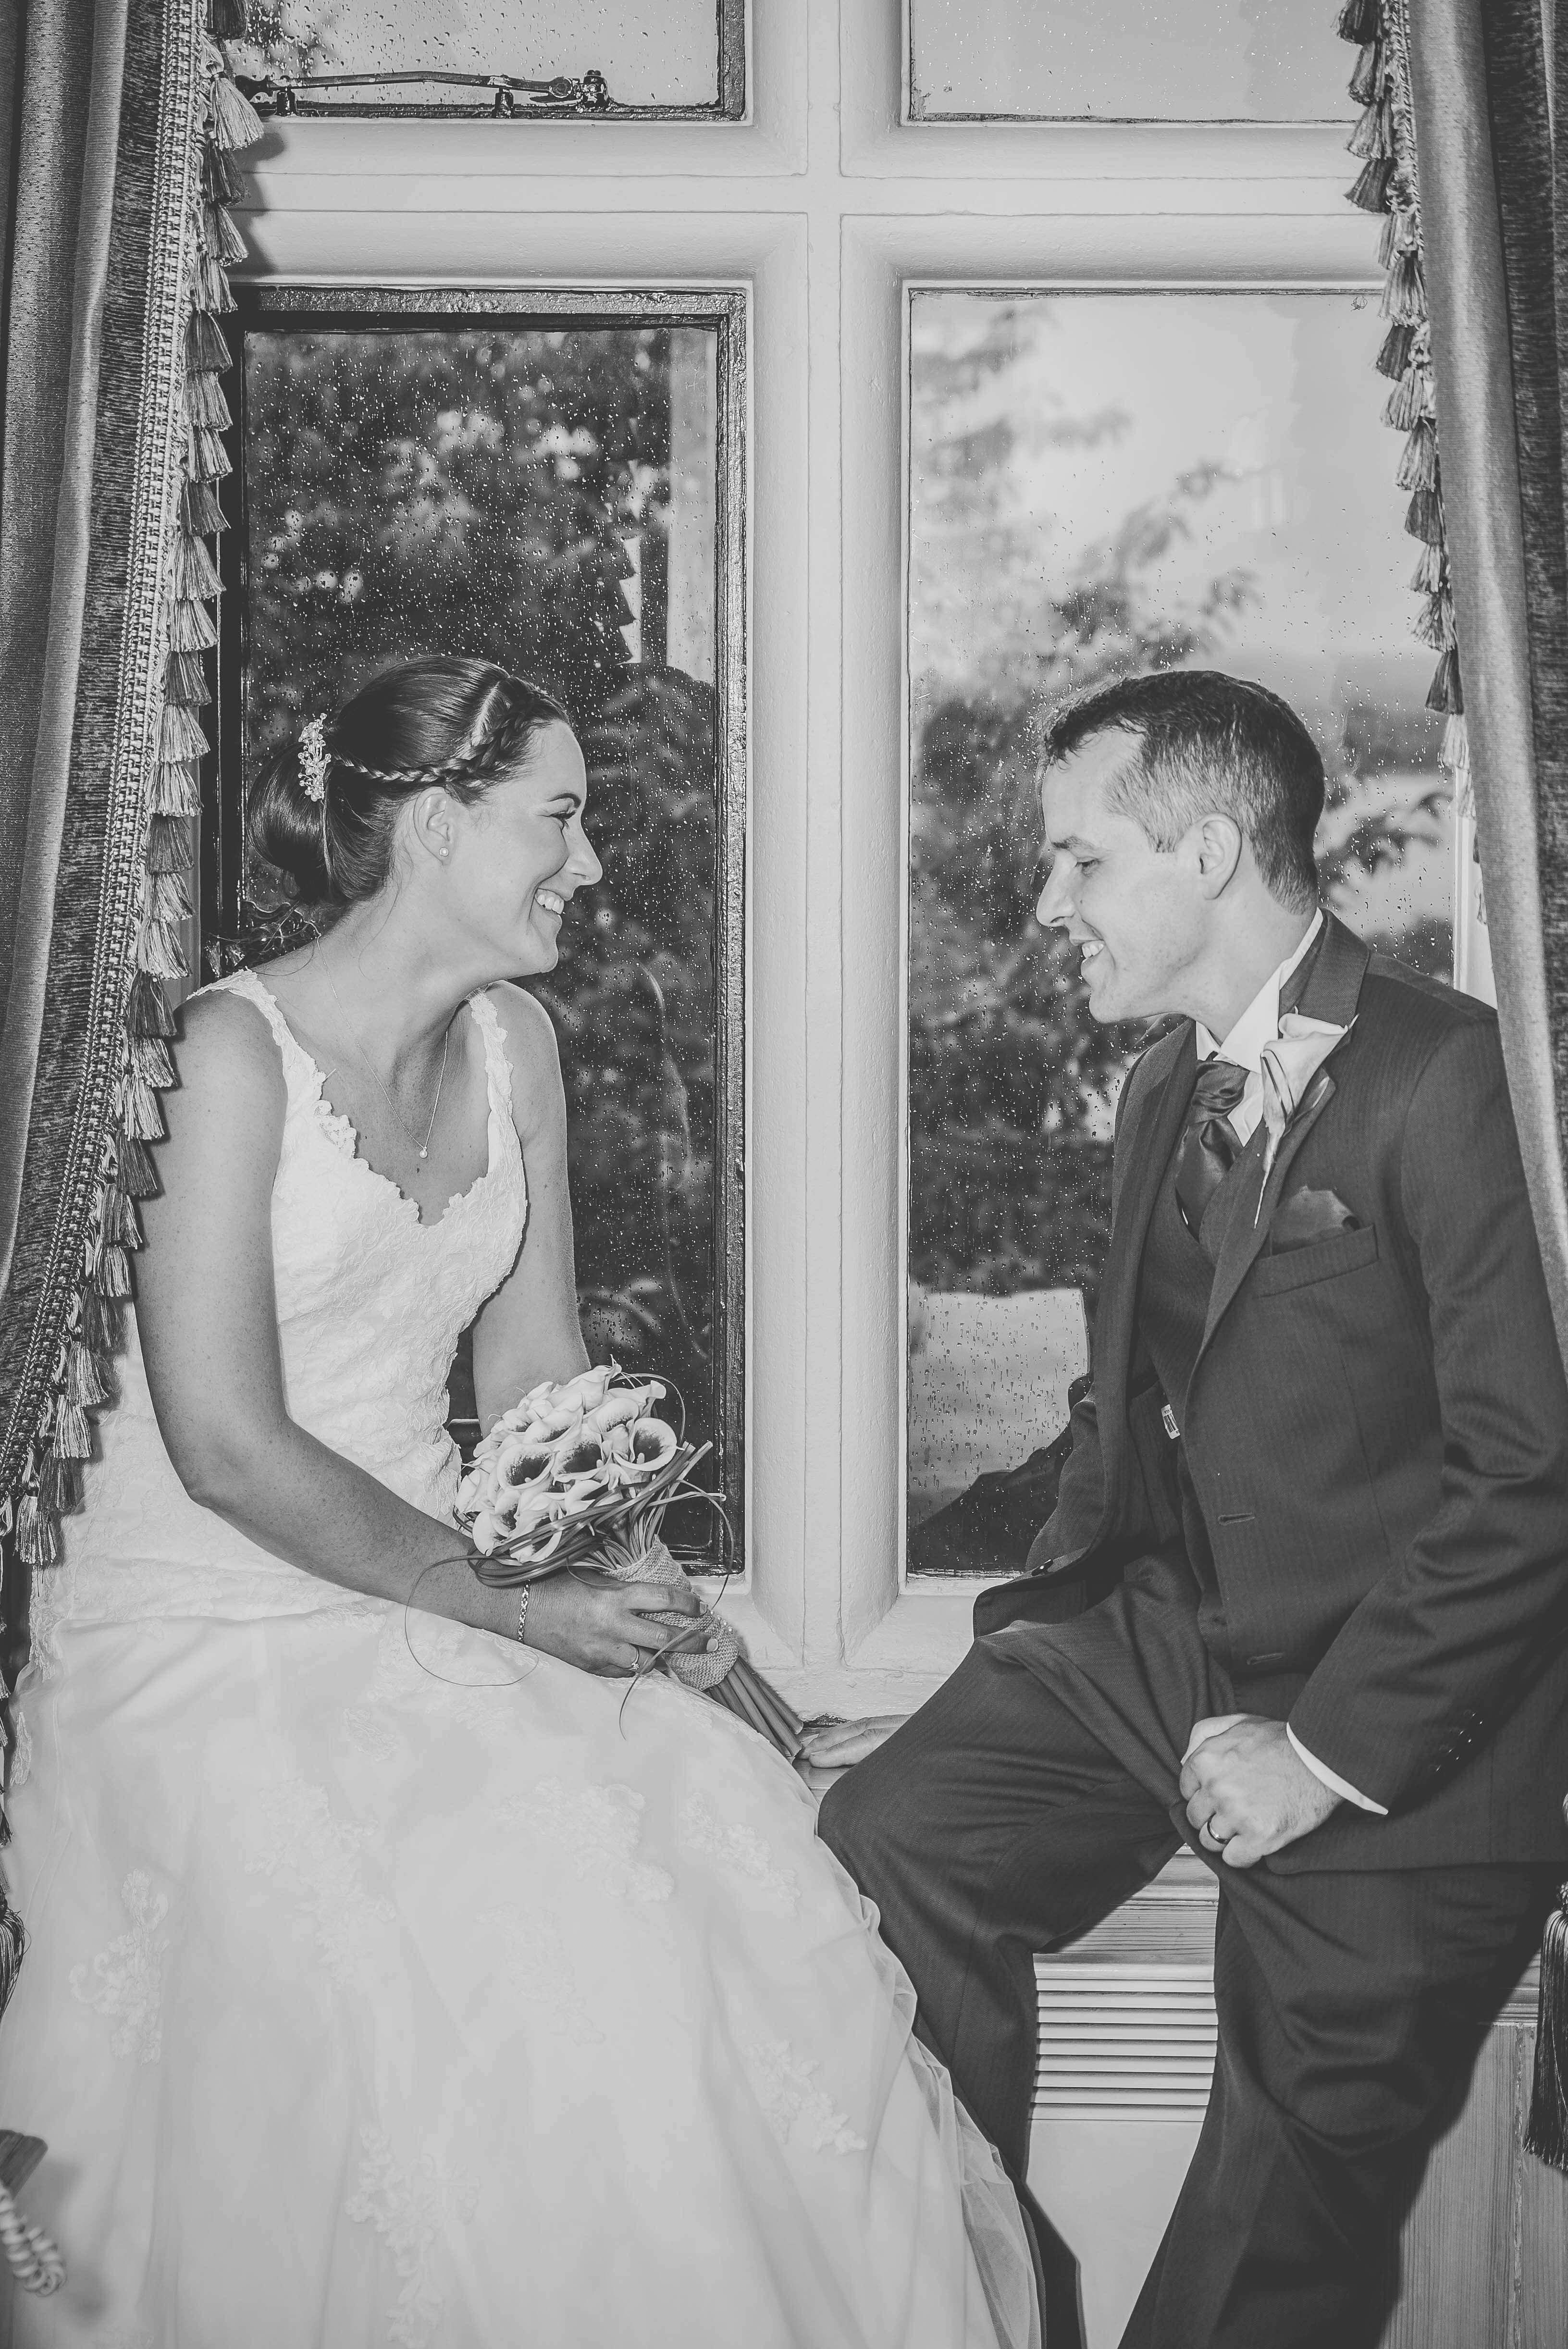 Barnsdale Hall Rutland Wedding 13 10 2016 24